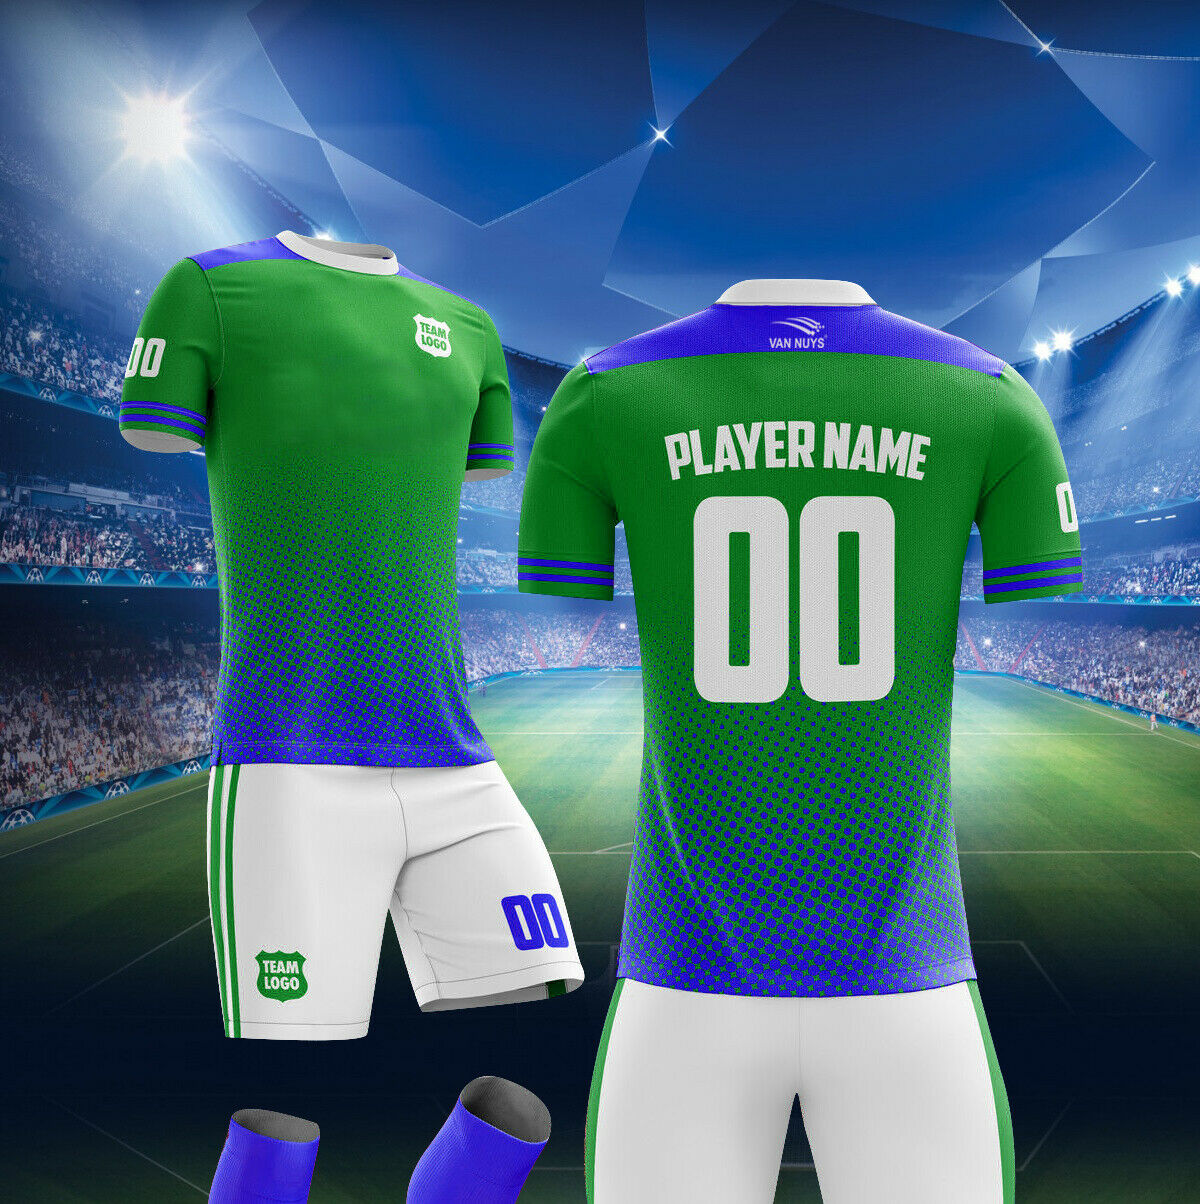 10 Kit de fútbol uniformes Personalizados Club Fútbol uniformes  set Camiseta + Pantalones Cortos + Medias